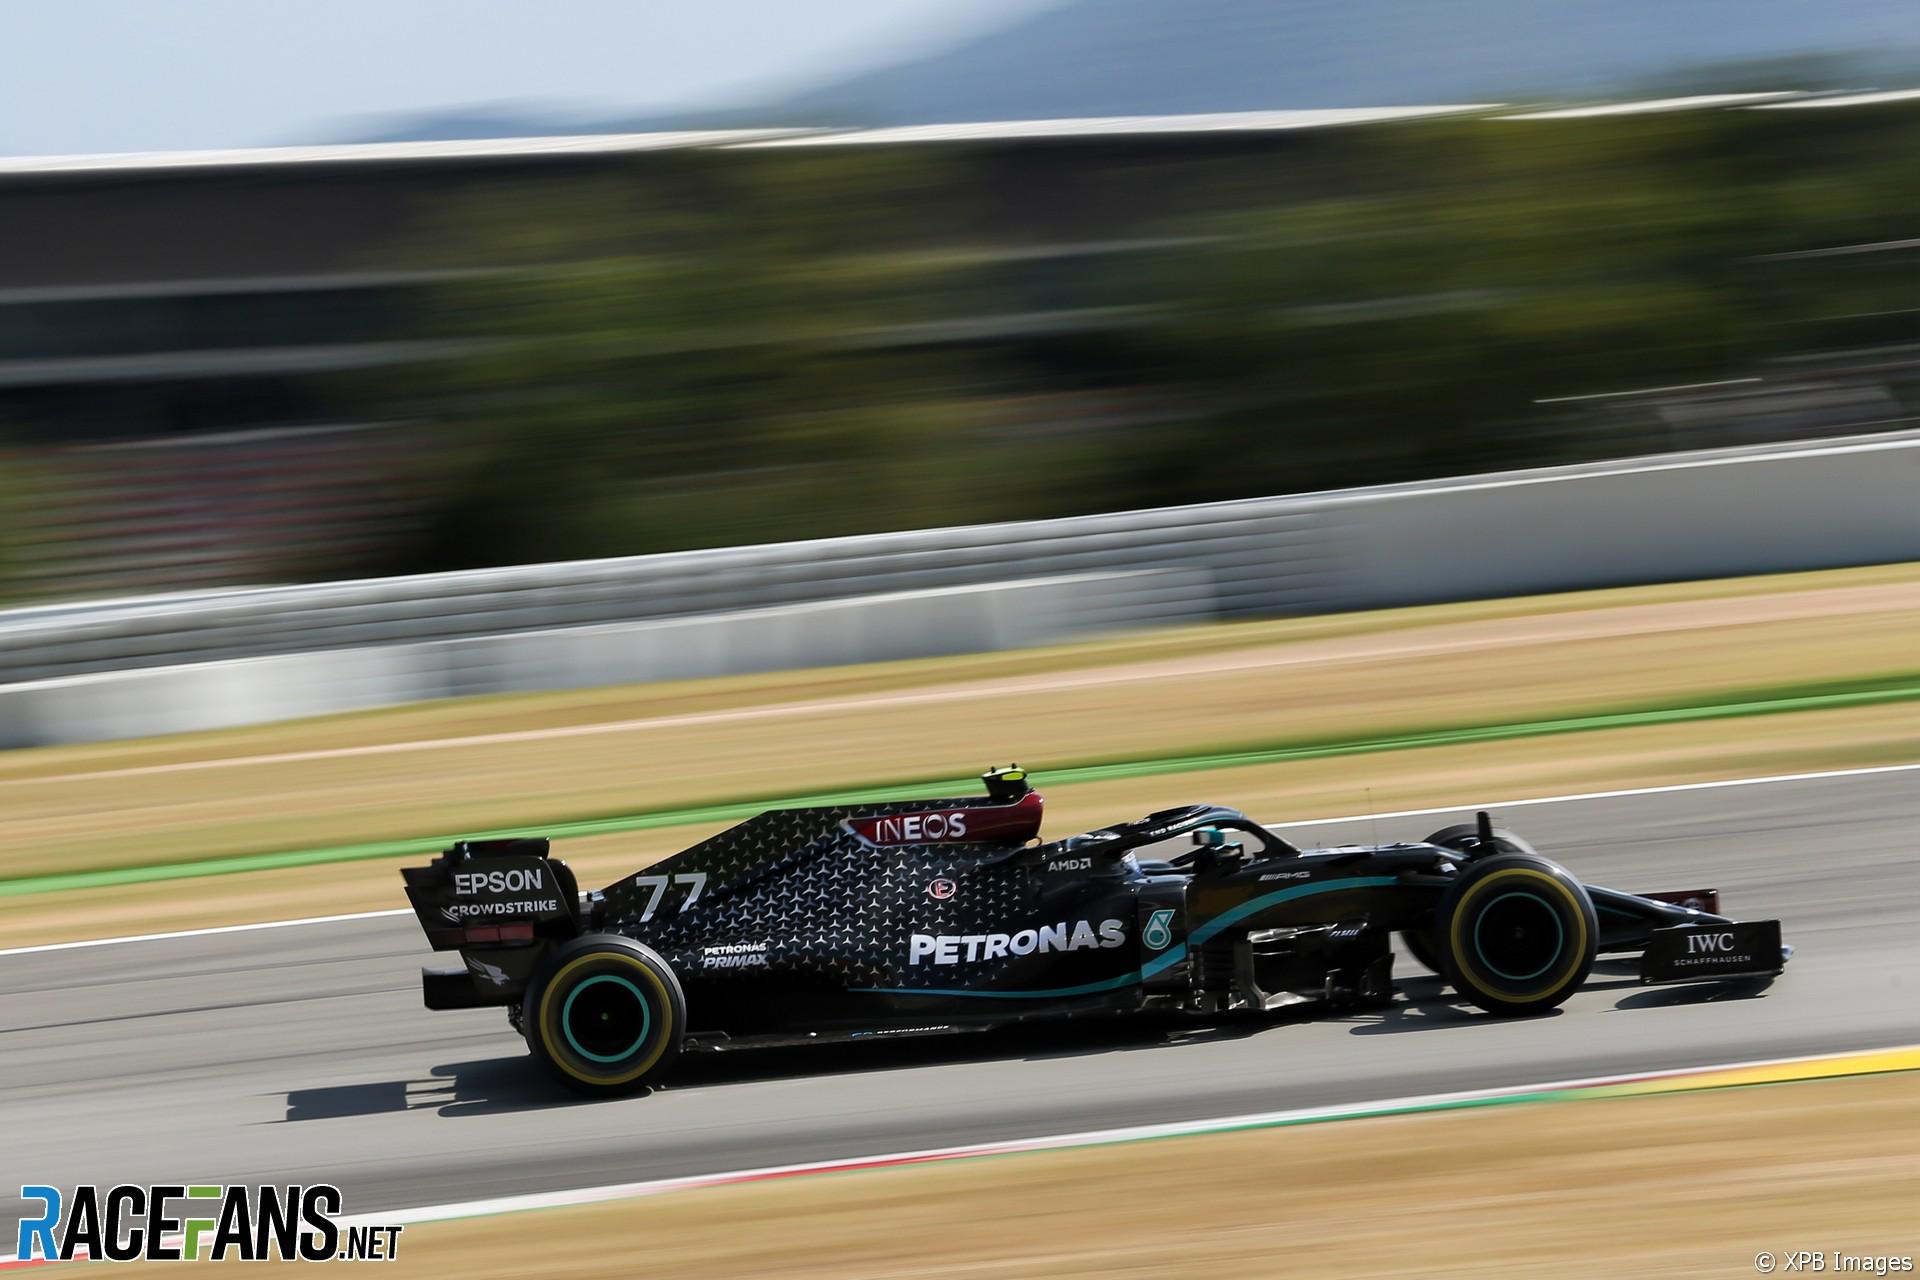 Valtteri Bottas, Mercedes, Circuit de Catalunya, 2020